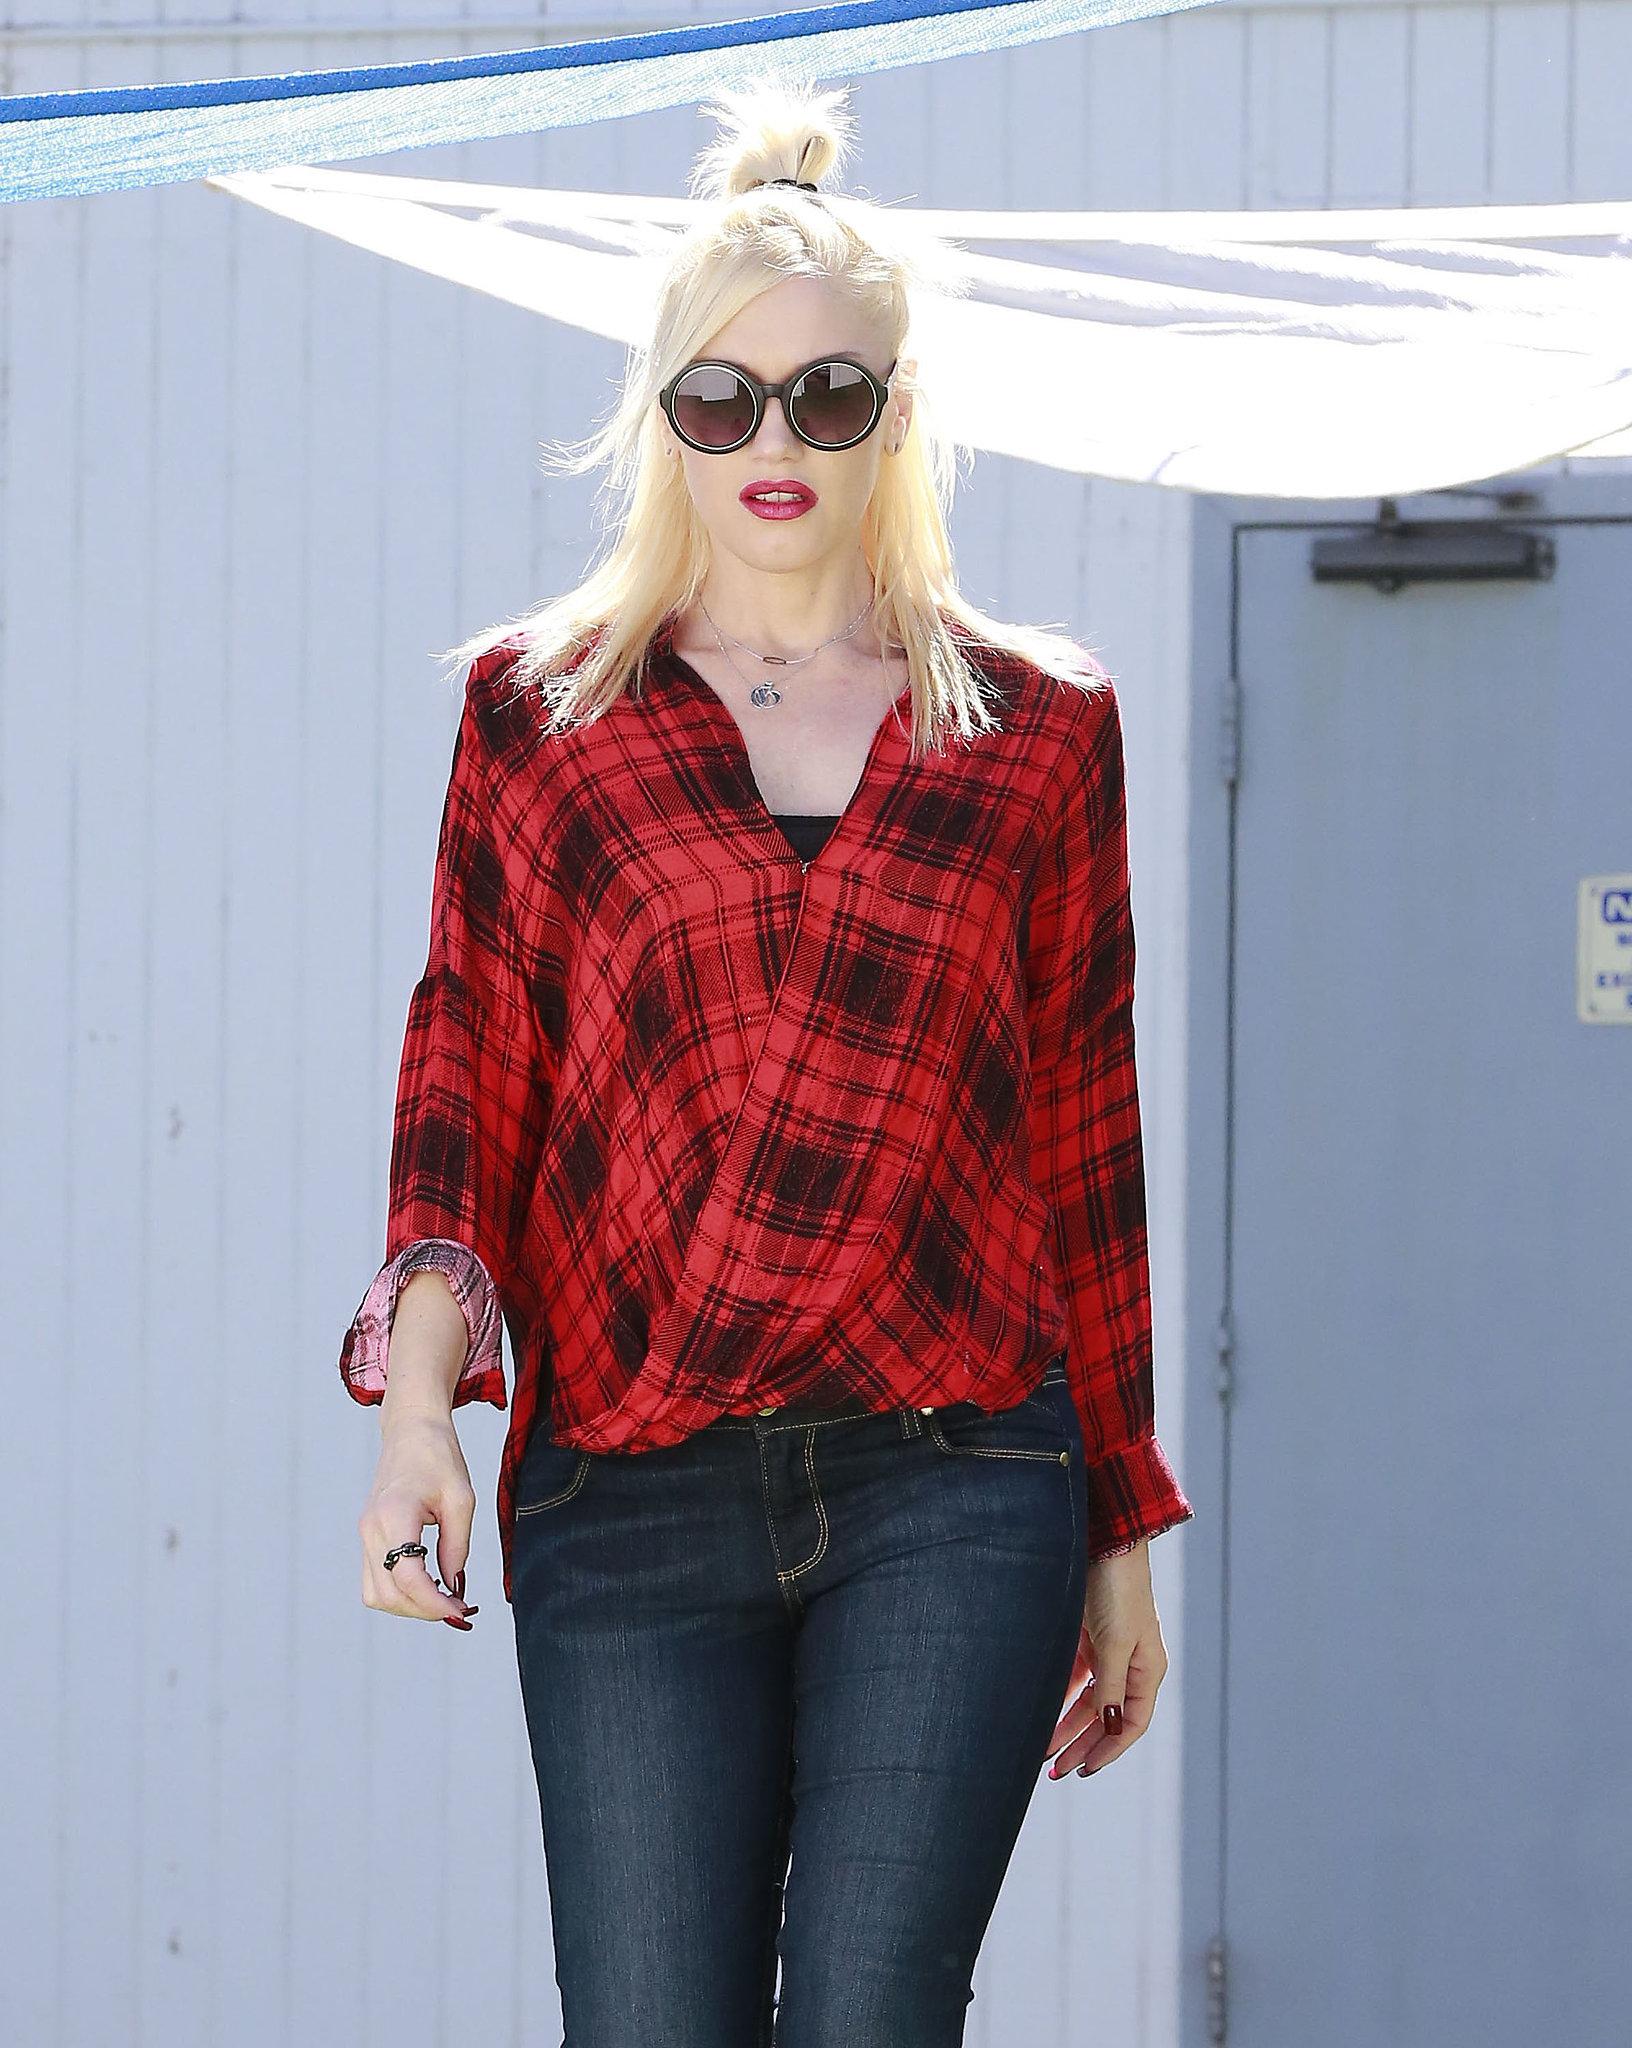 Gwen Stefani Gets Back to Halloween Duties After Debuting Her Baby Bump